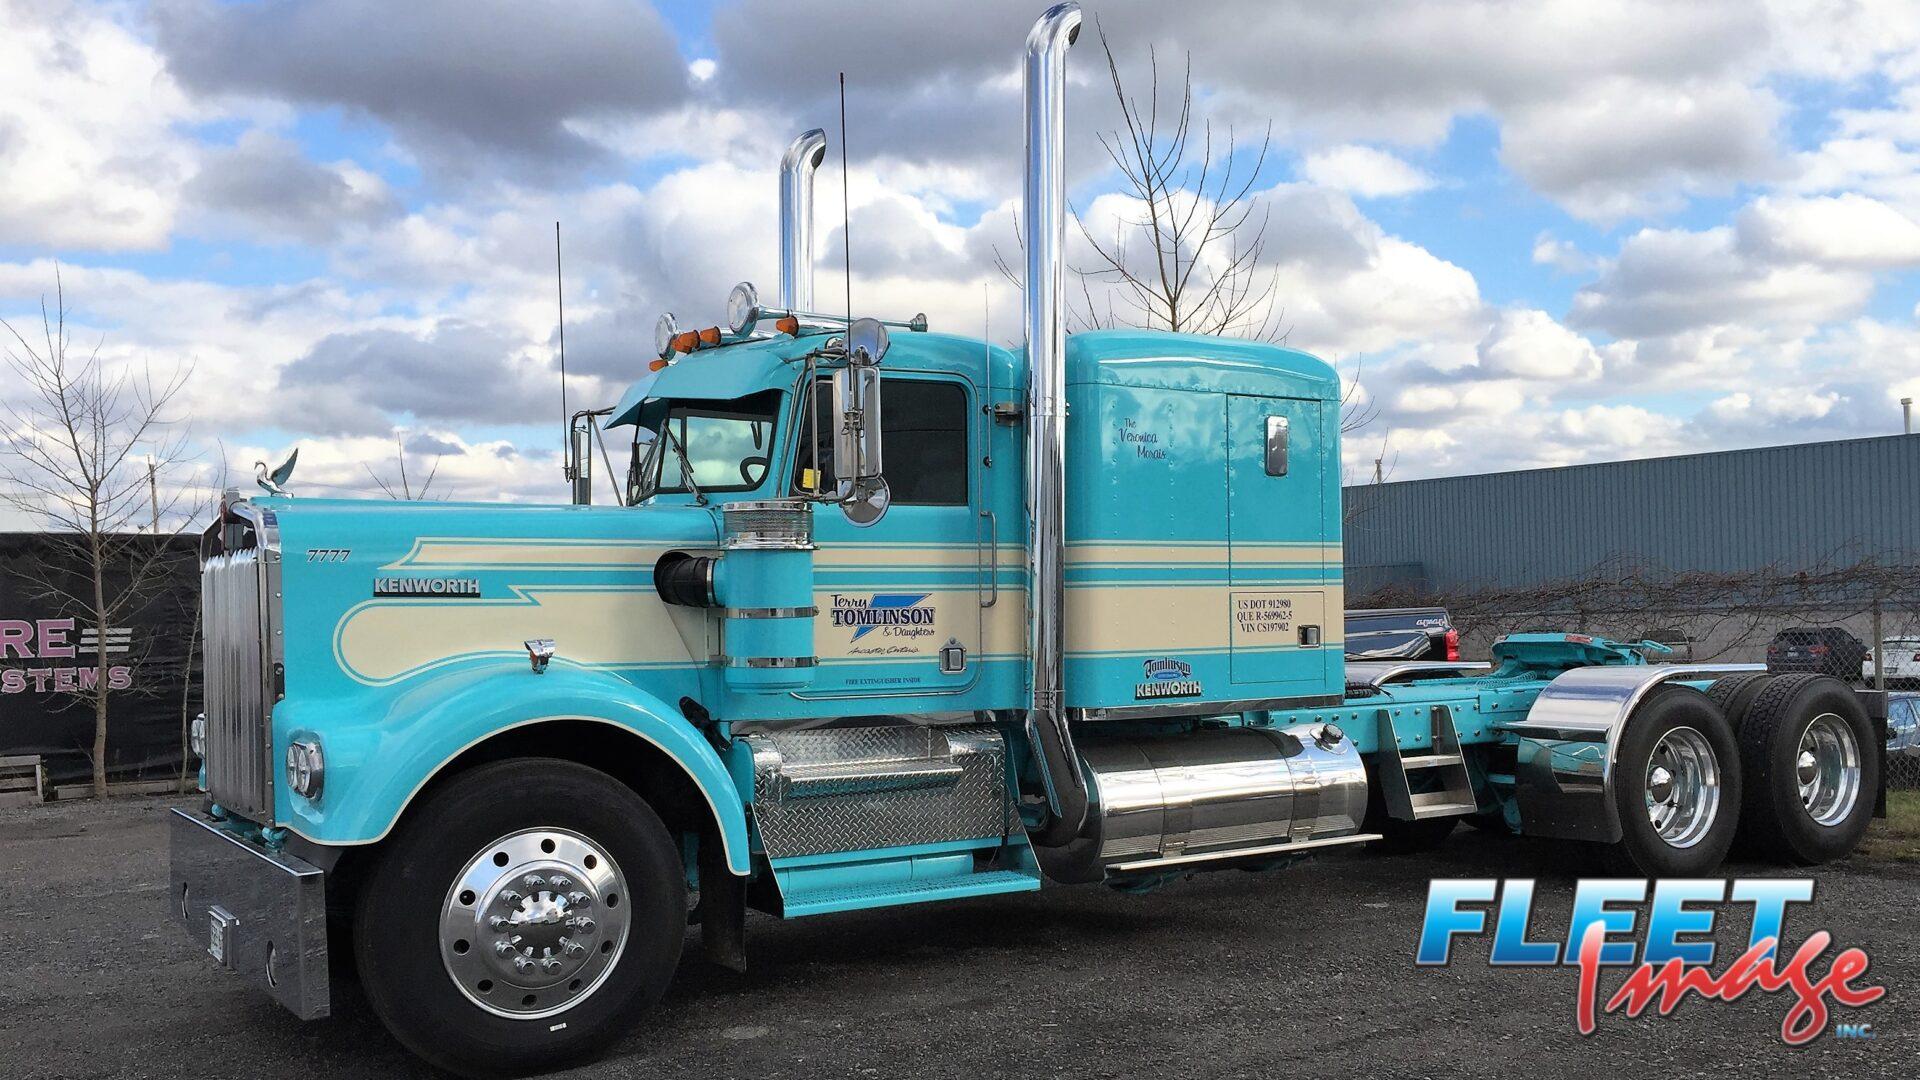 Terry Tomlinson & Daughter blue truck